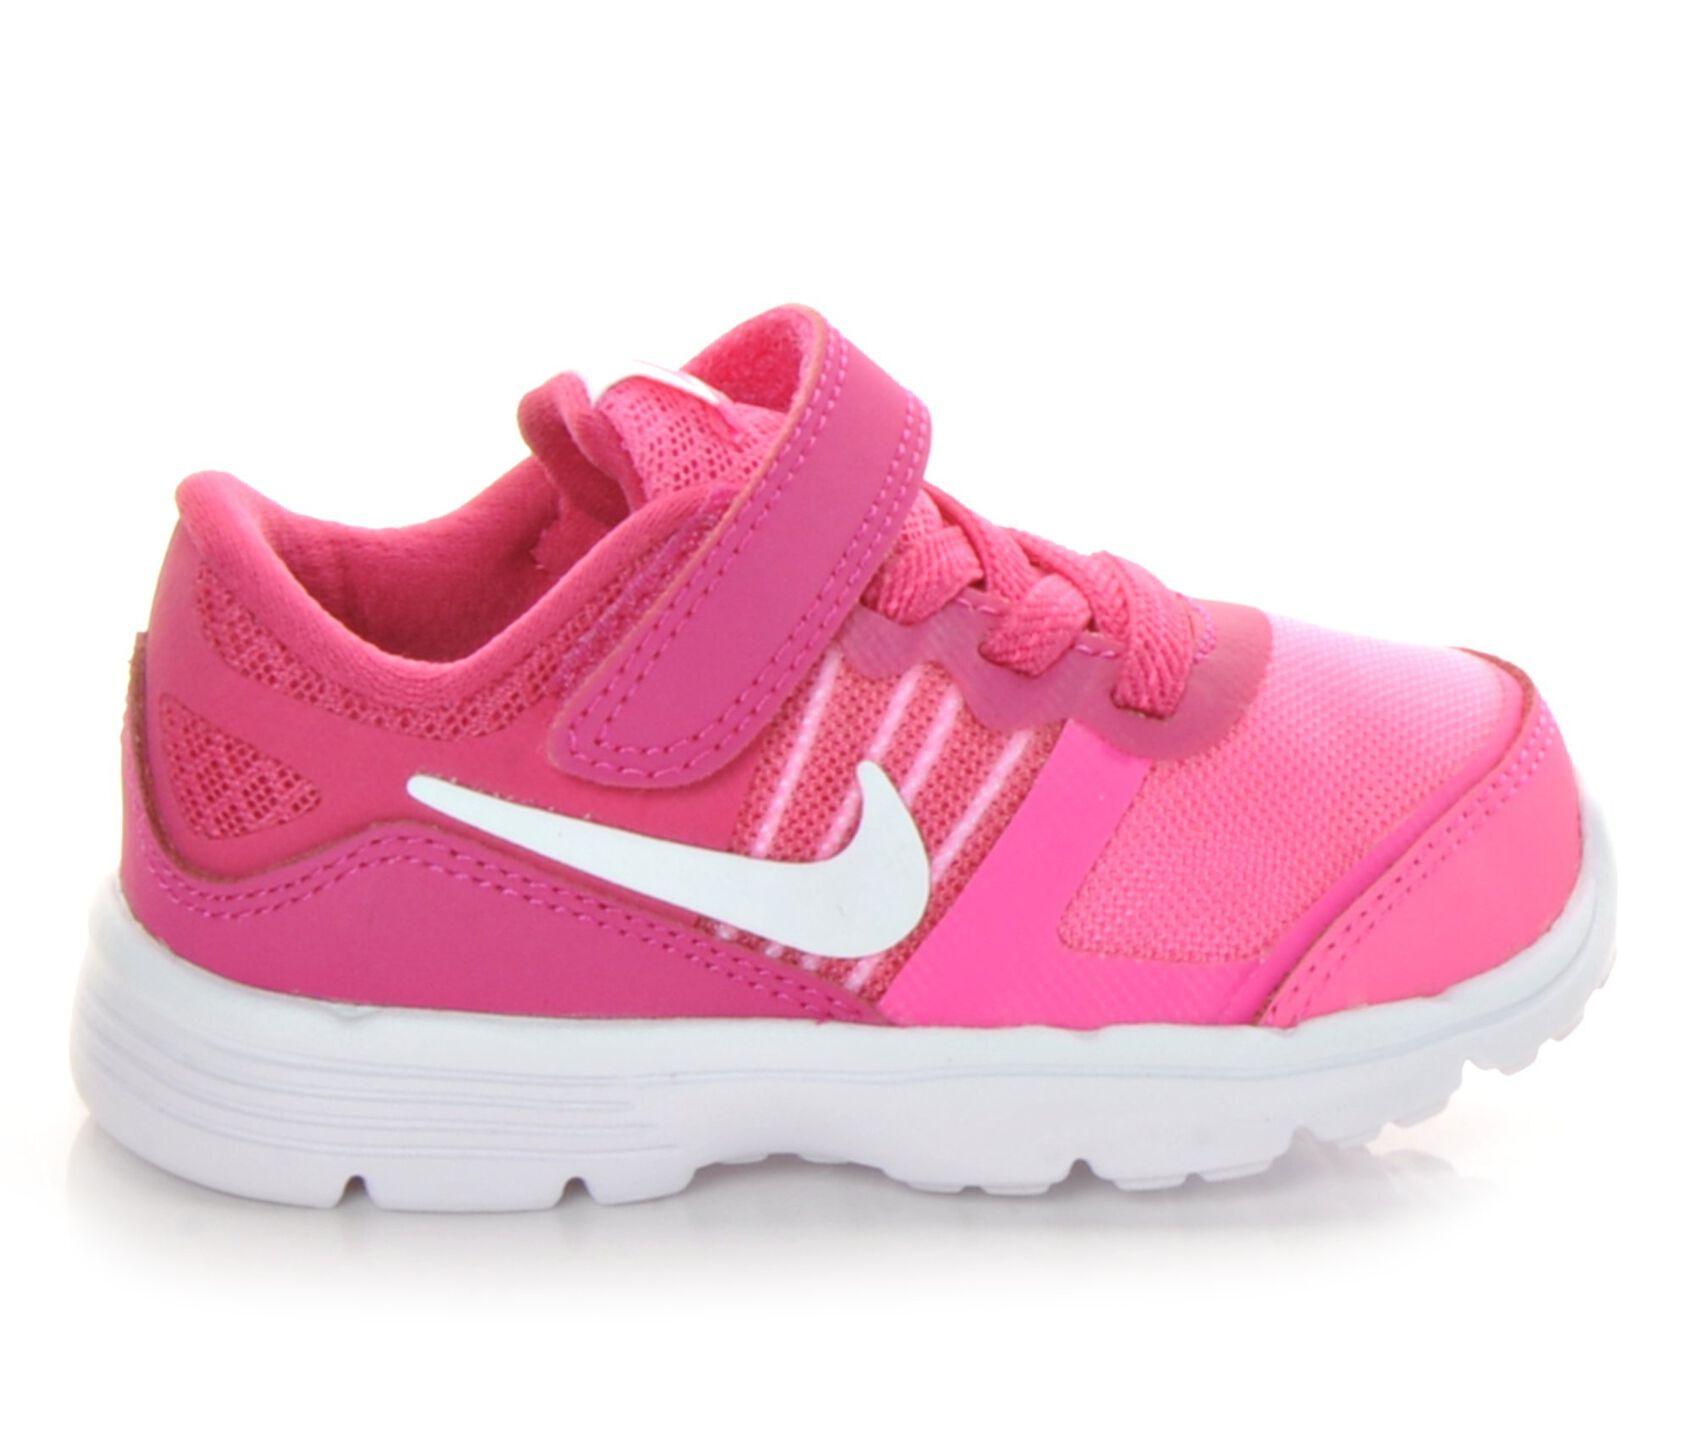 Girls Nike Infant Fusion Kids Girls Athletic Shoes